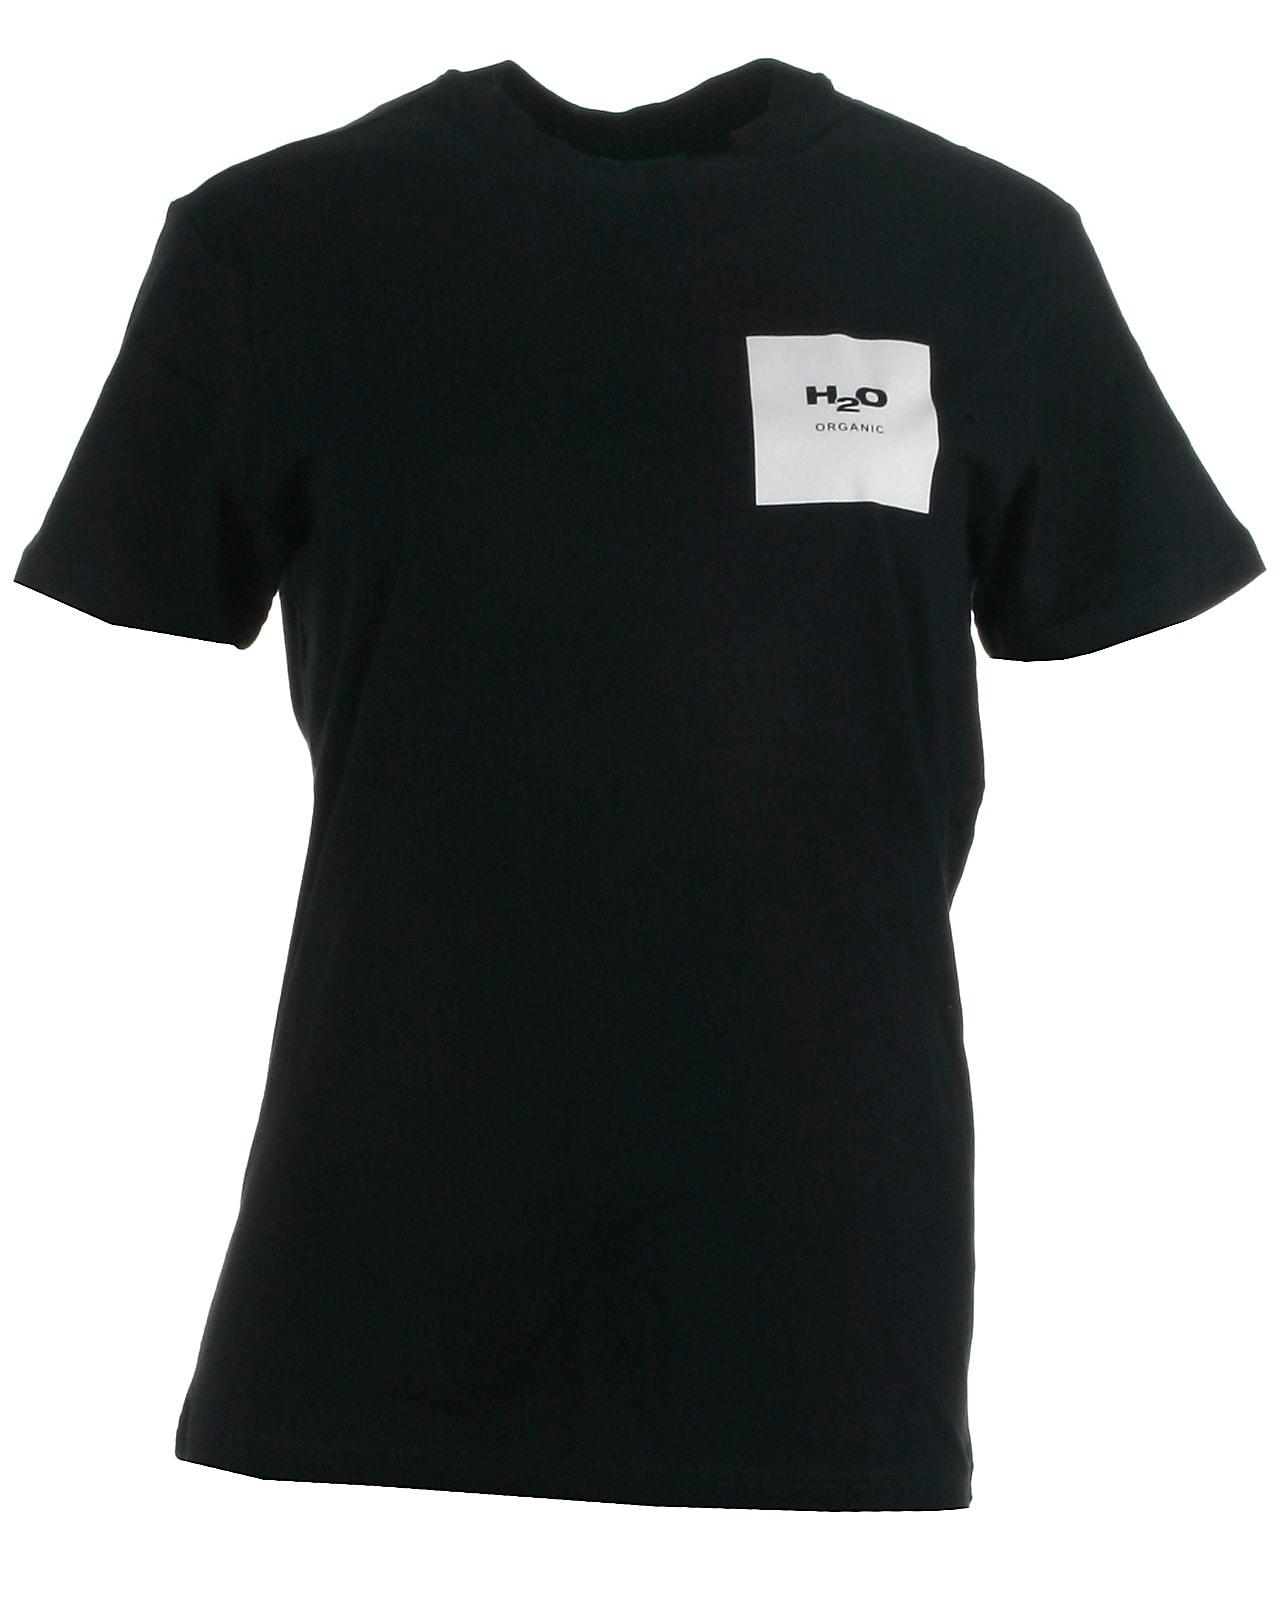 Image of H2O t-shirt s/s, Lyø, navywhite